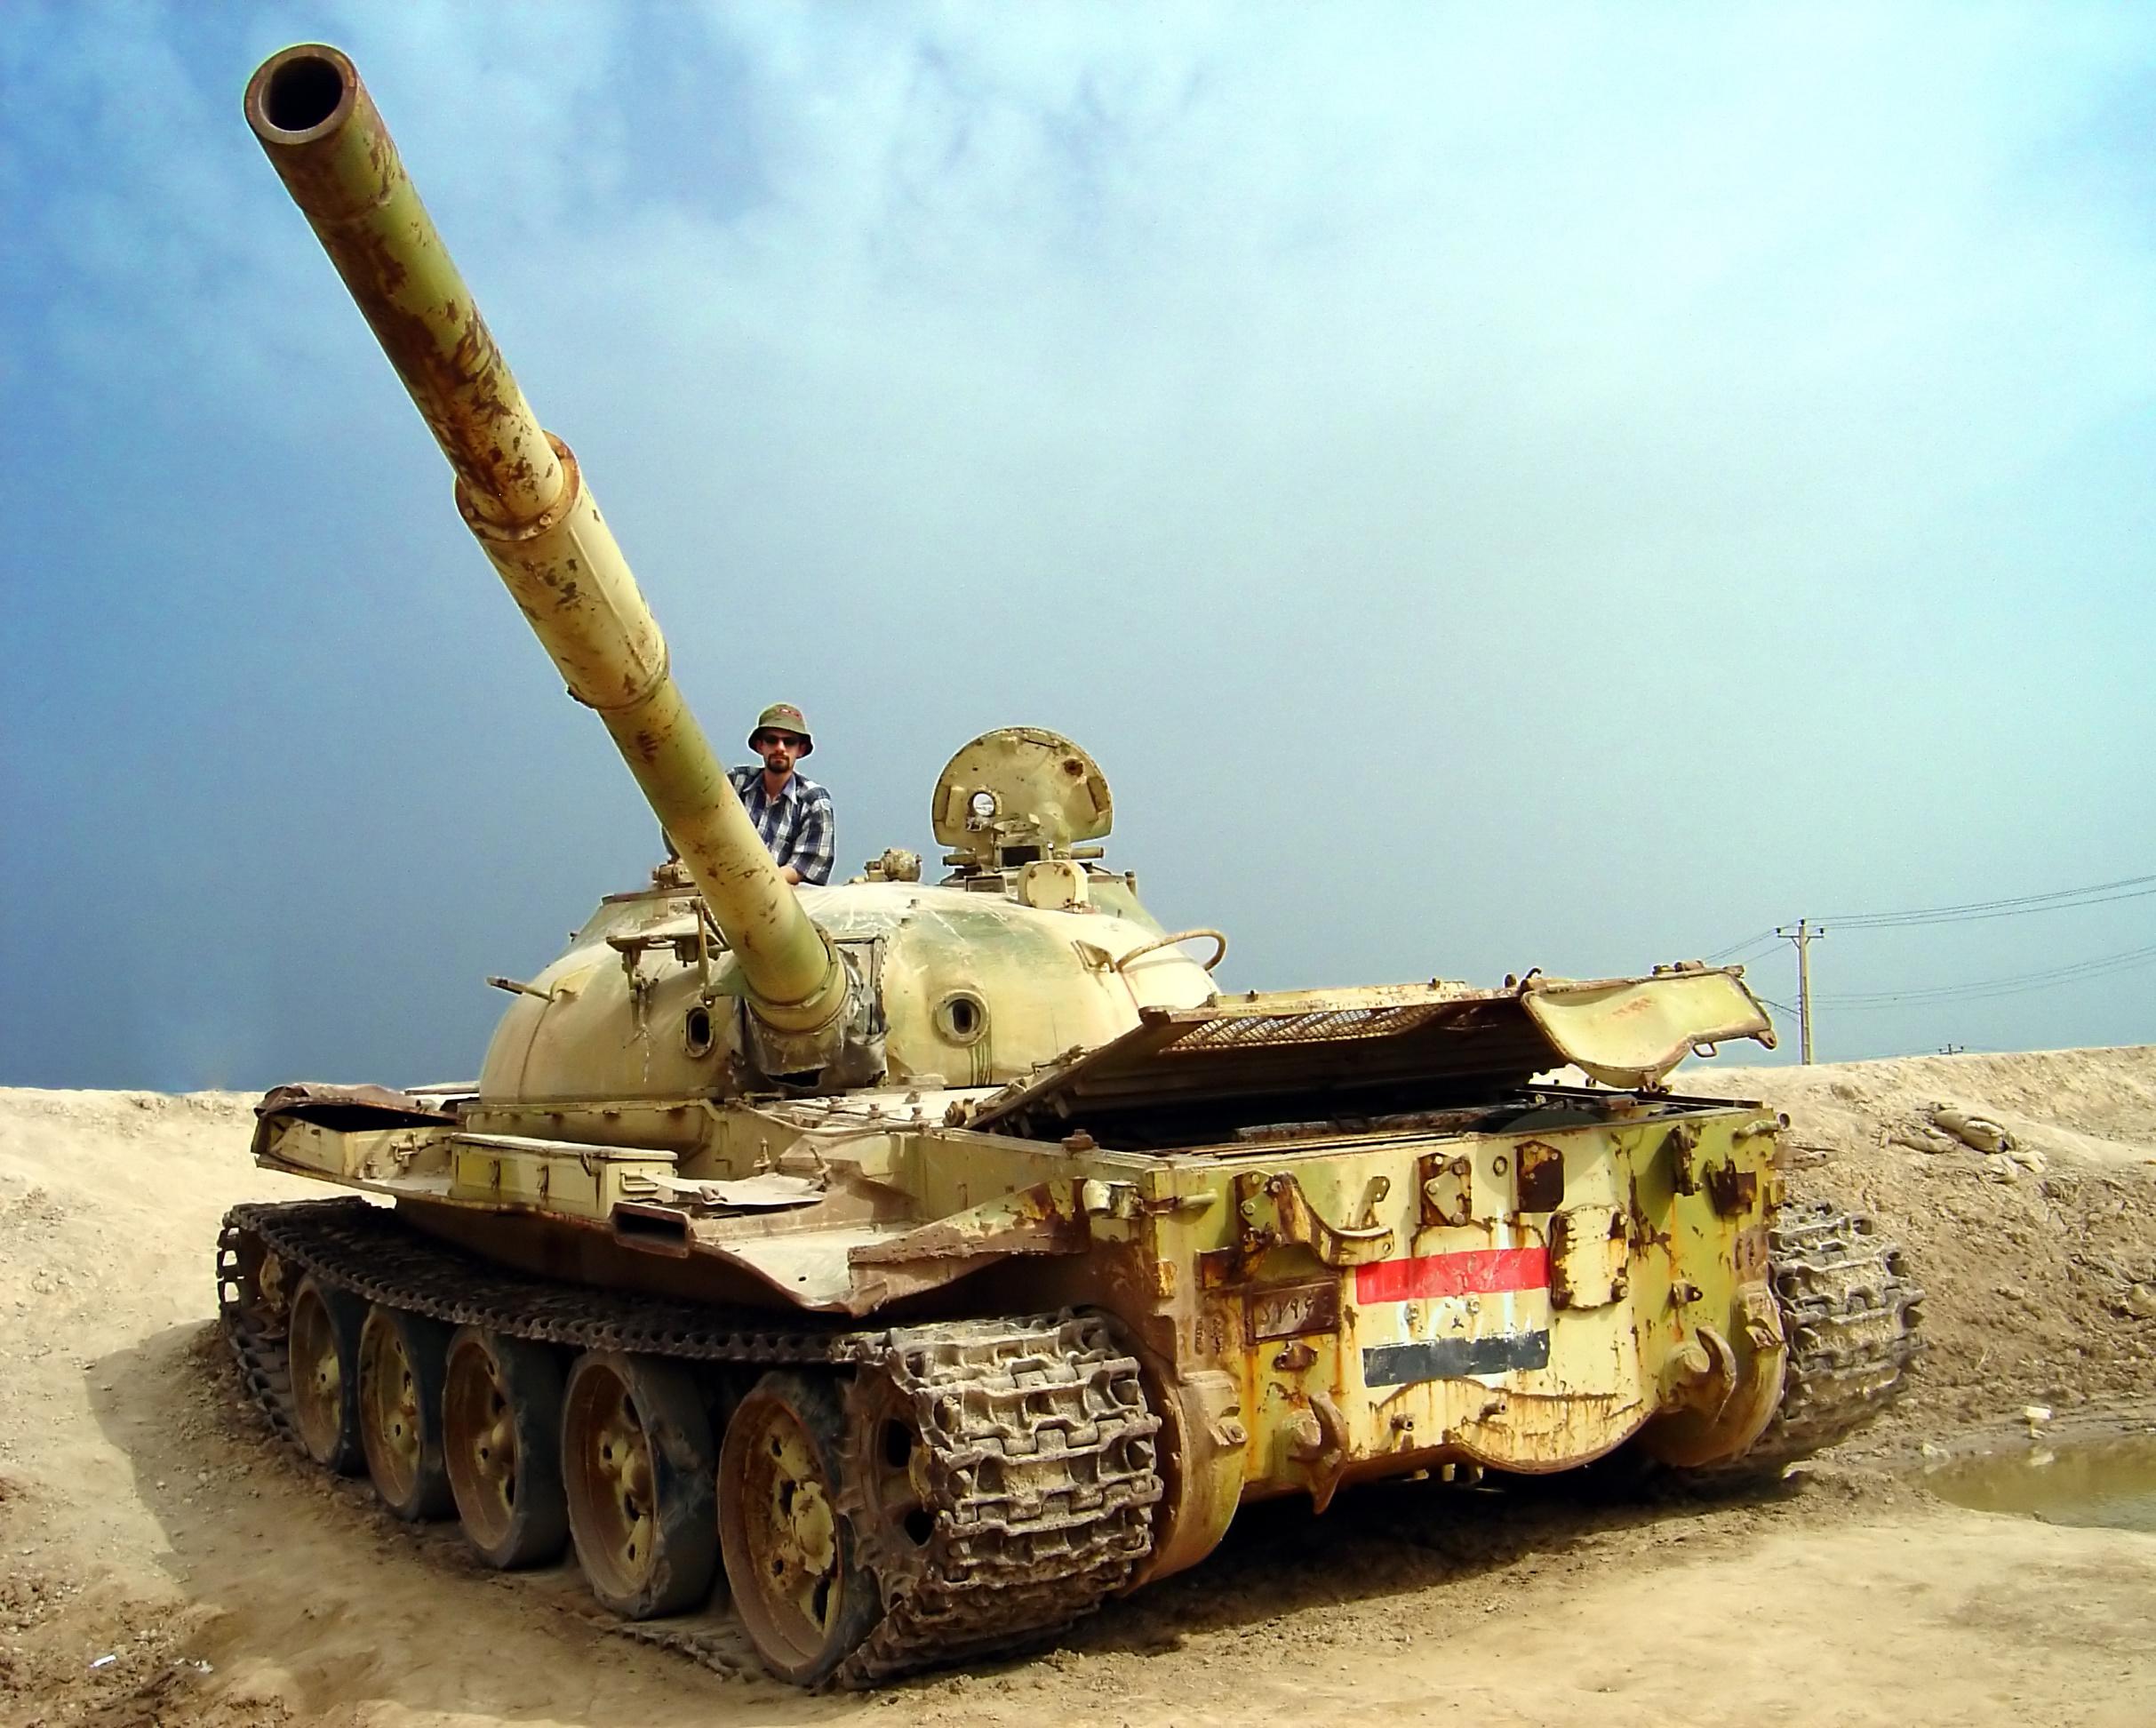 İran - Irak Savaşı 1980 15